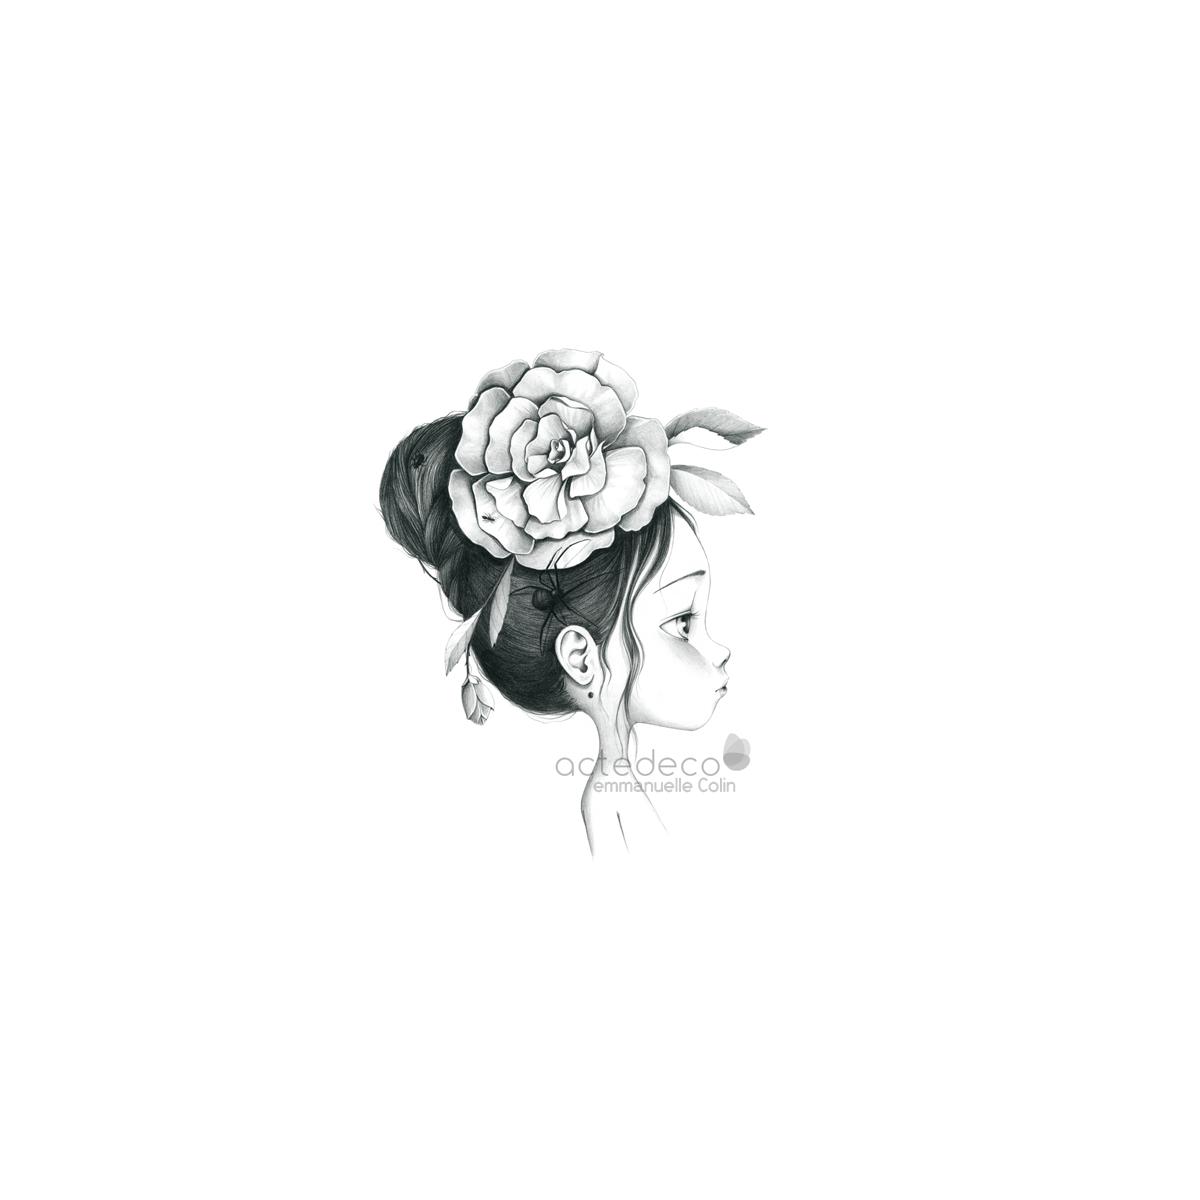 Tableau Wild girl 12-bw